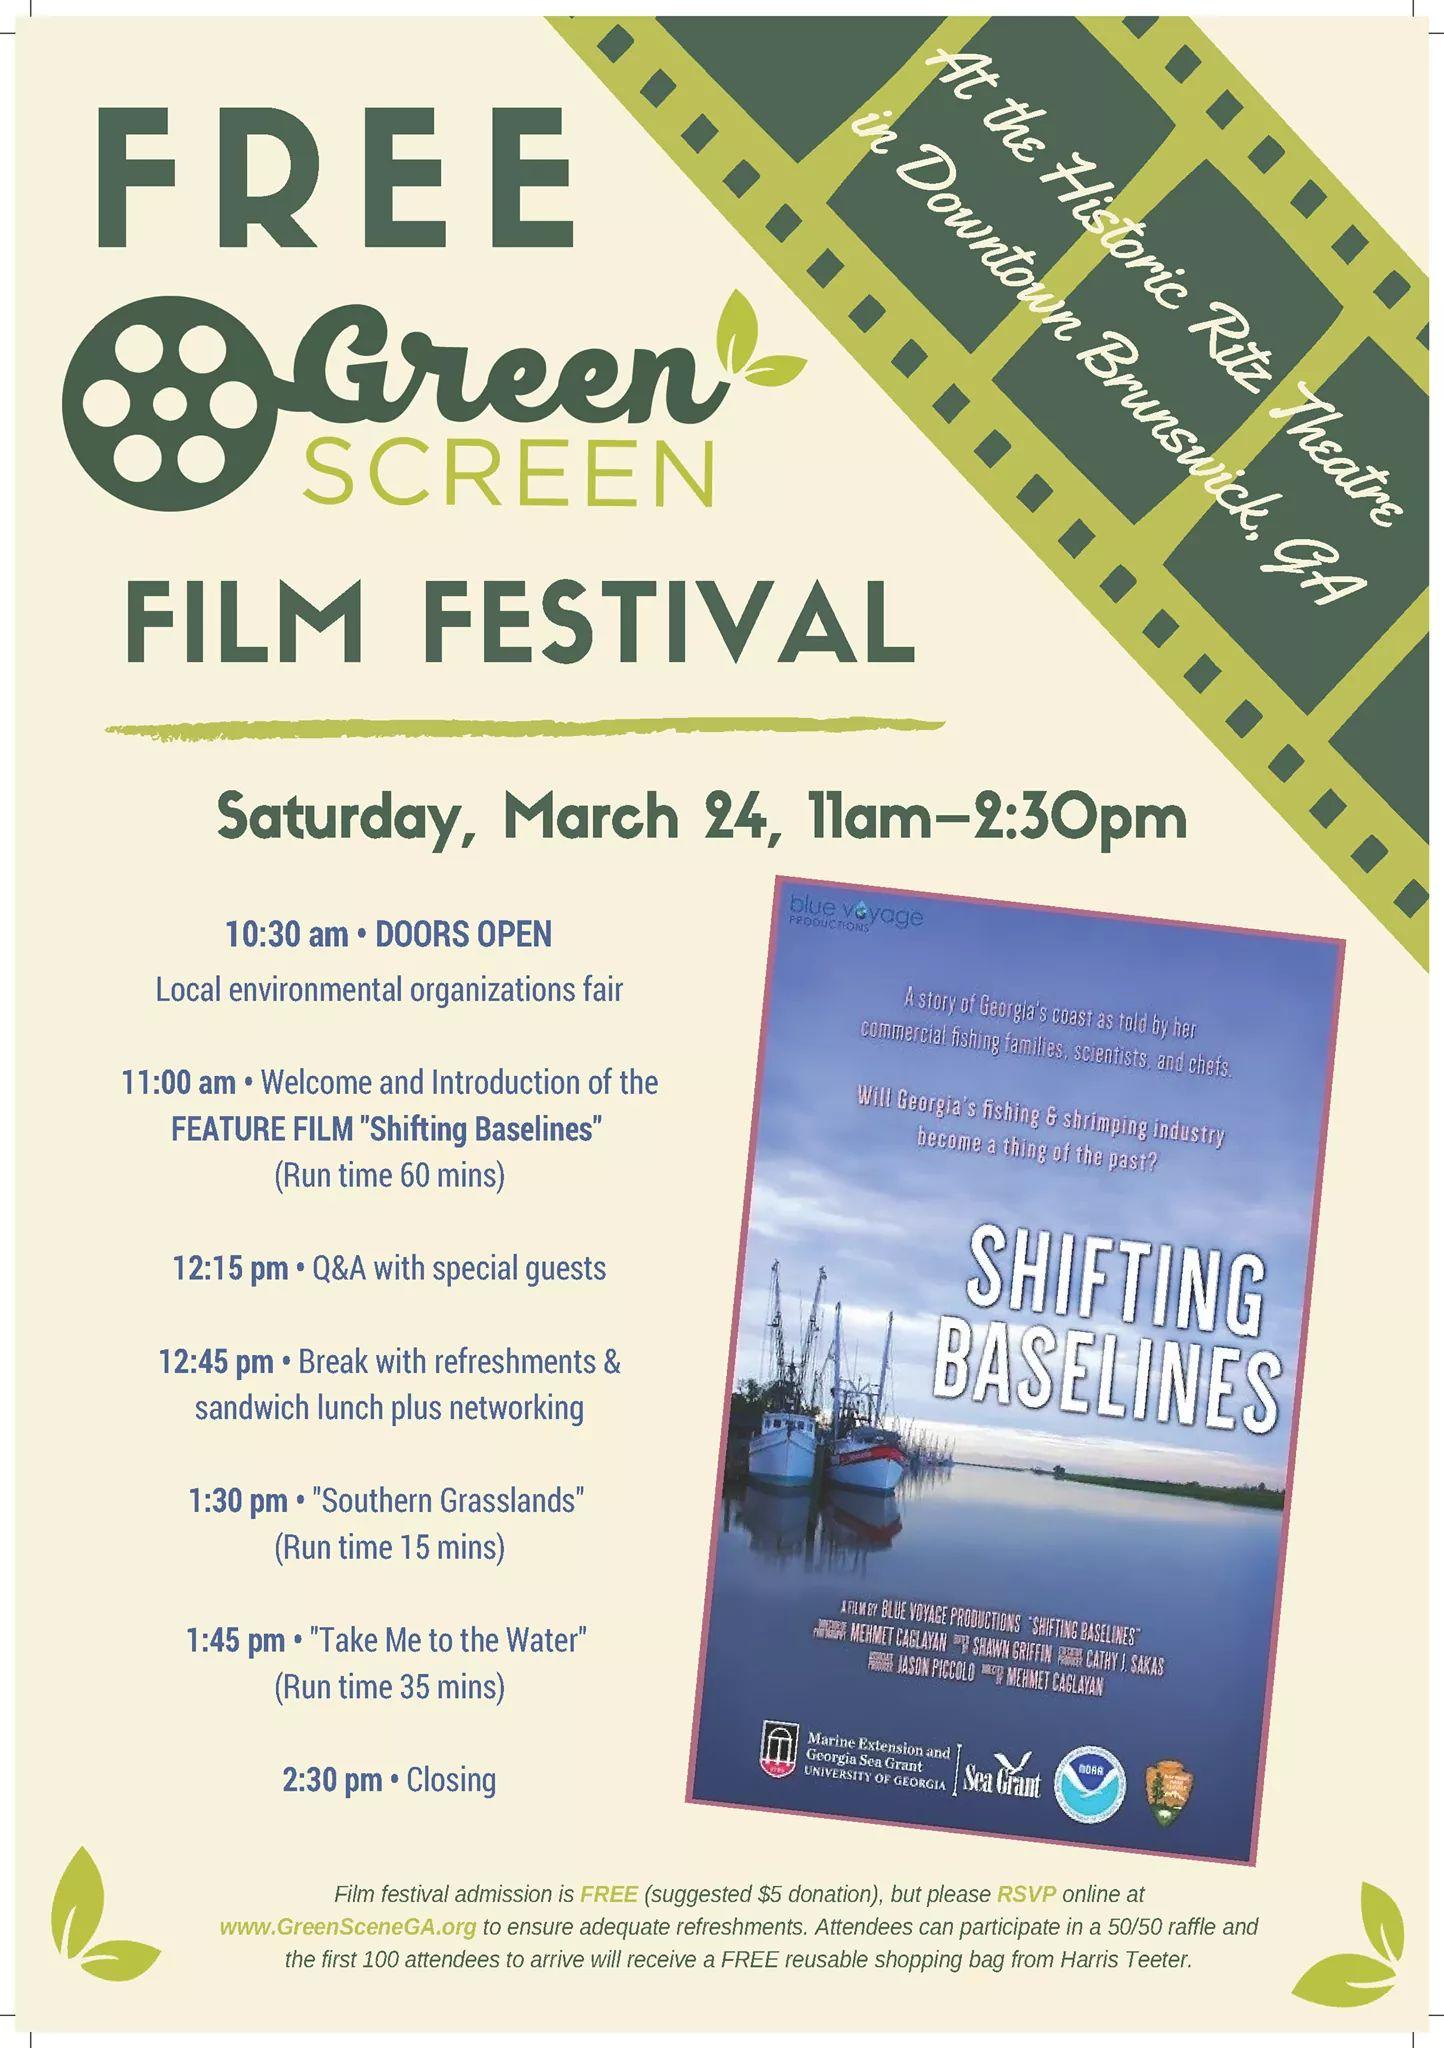 Free Green Screen Film FestivalLiberty County, Georgia | Hospitality ...